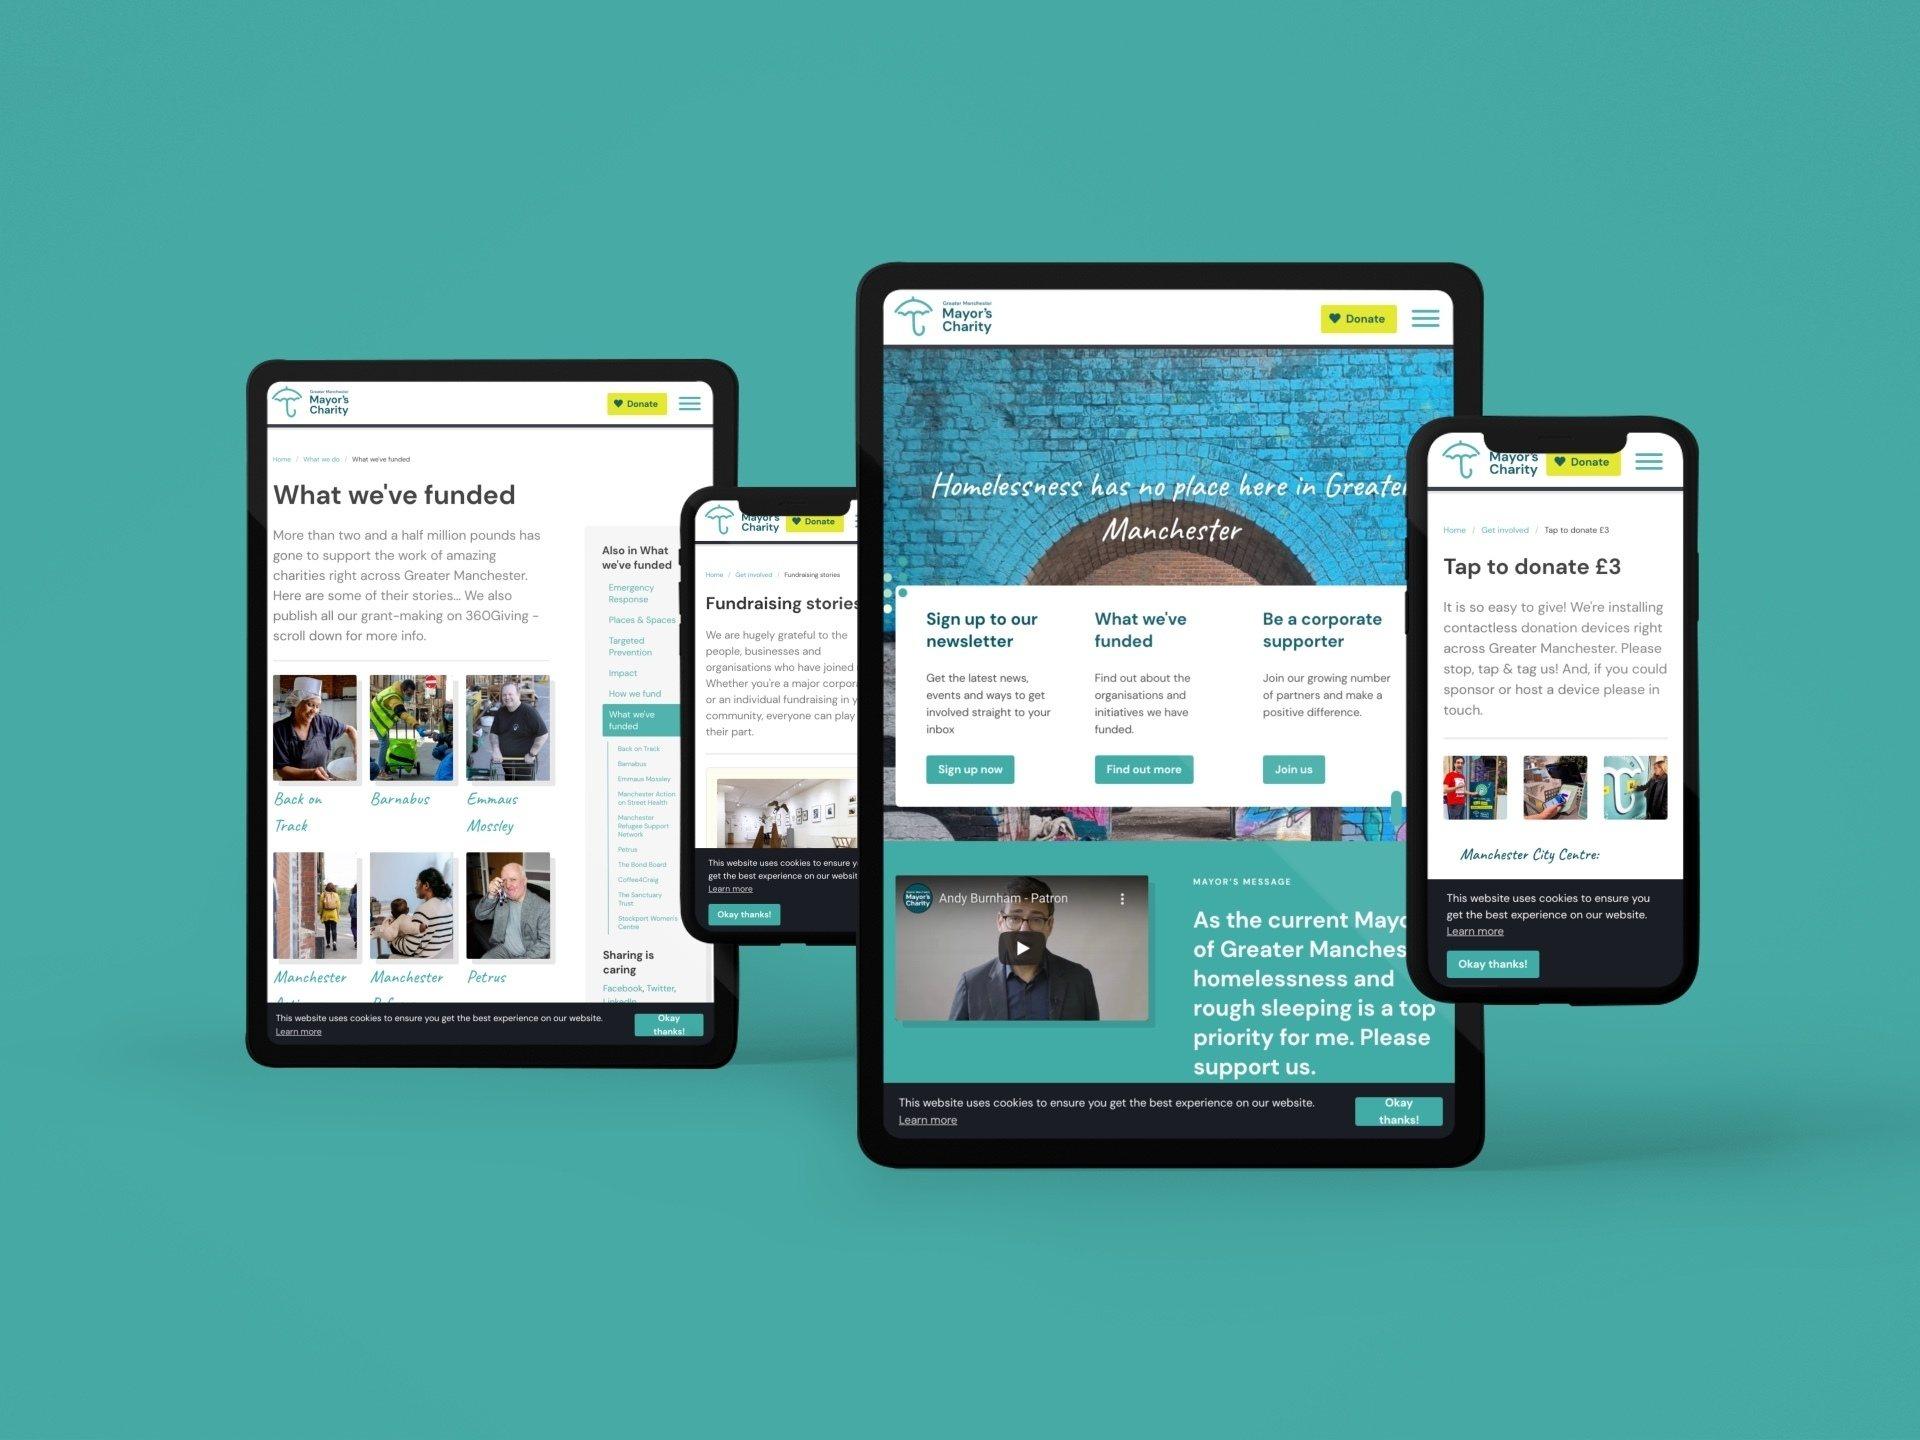 Greatermanchestermayor charitywebsite